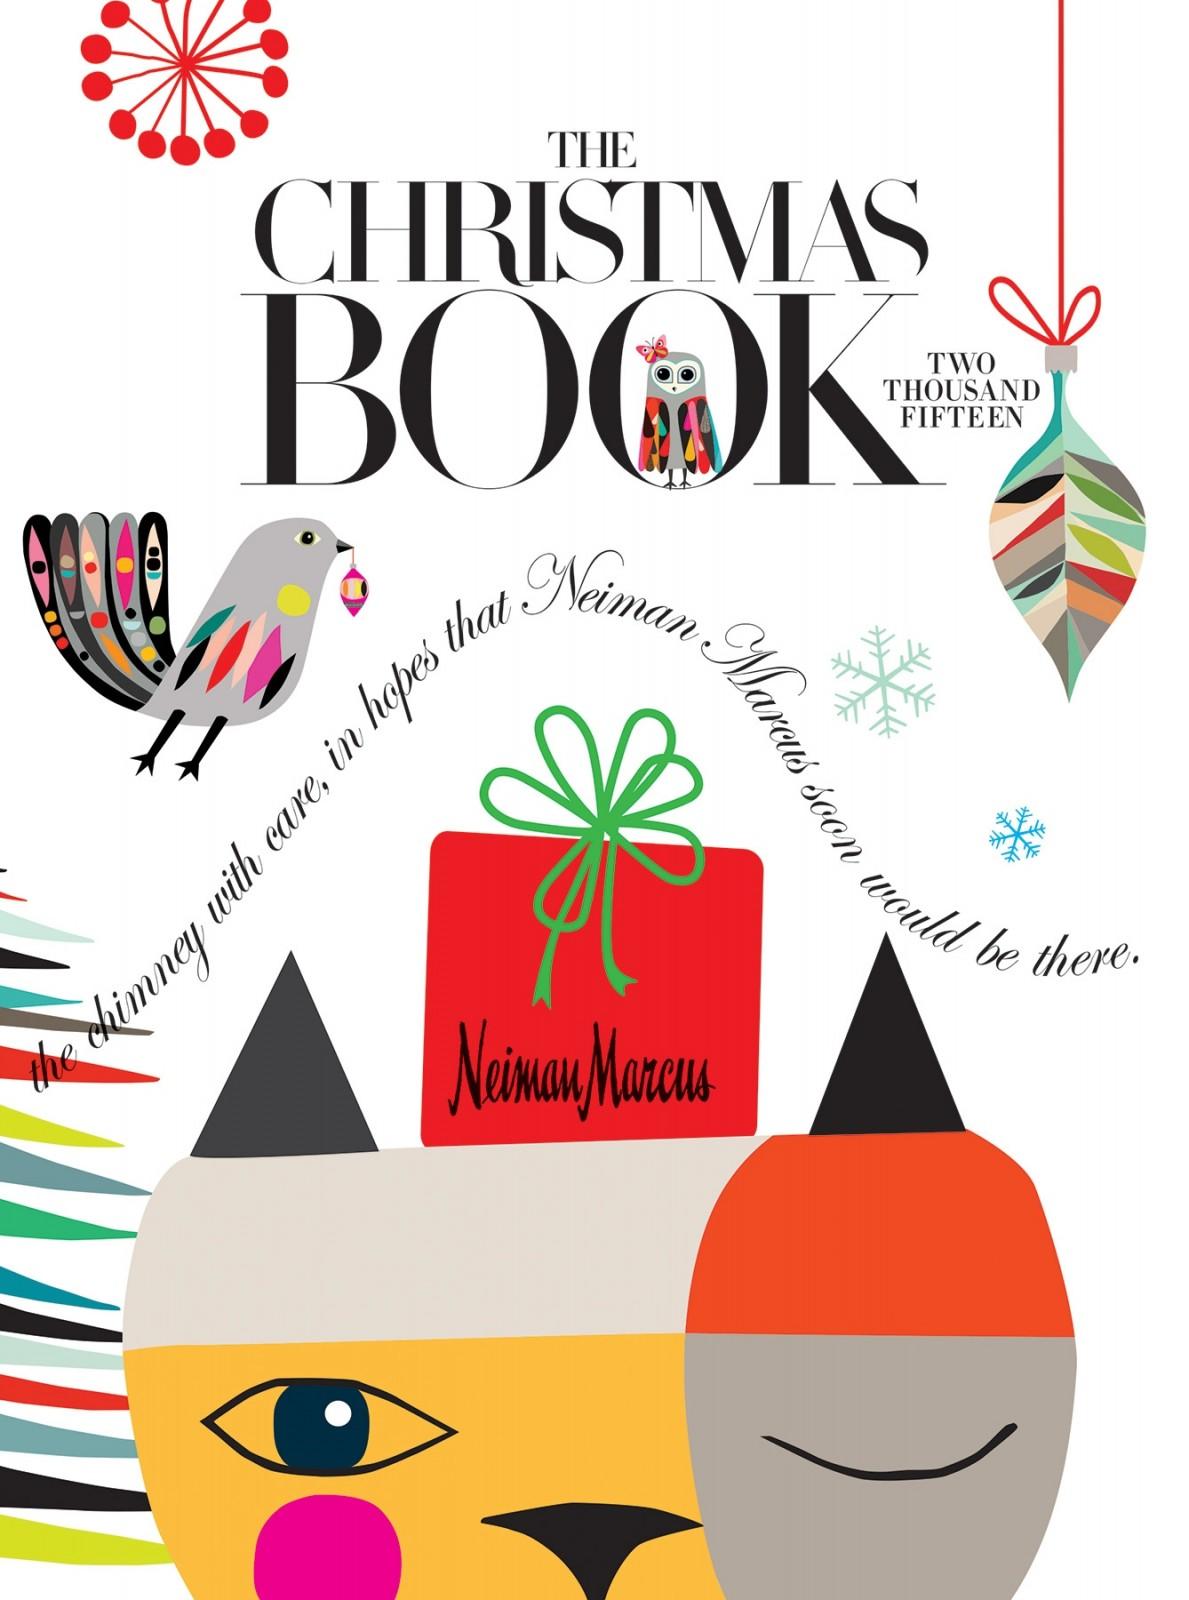 2015 Neiman Marcus Christmas Wish List....